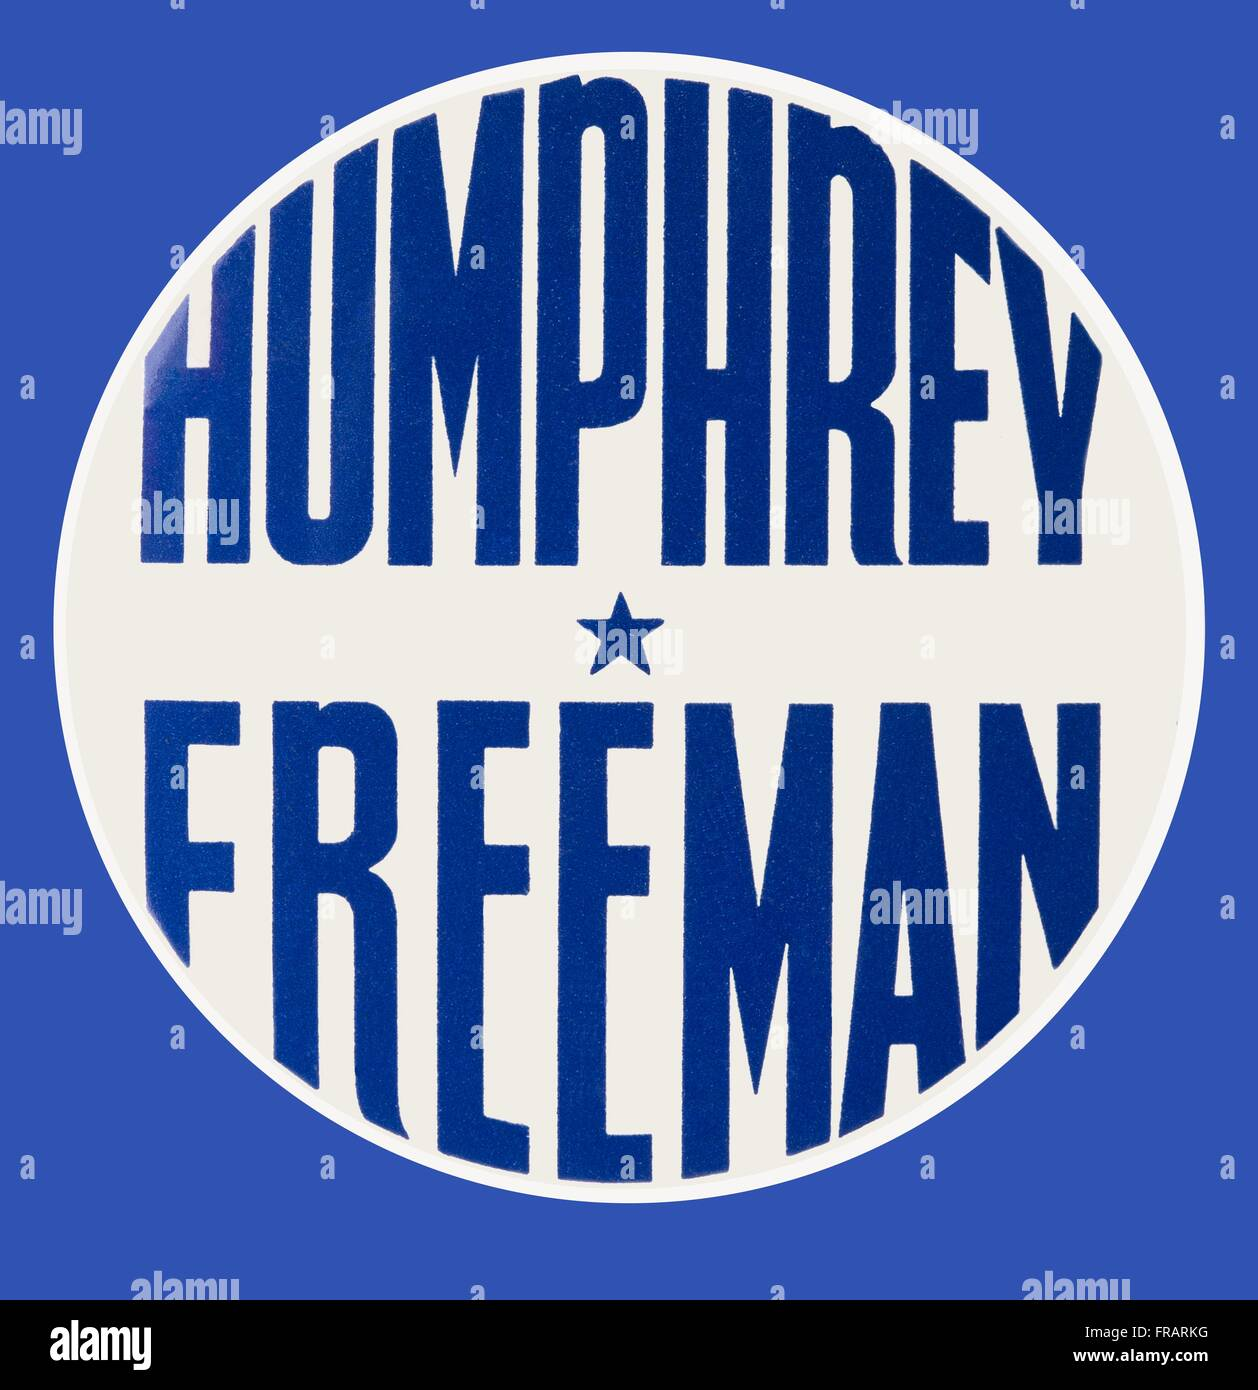 American political pinback campaign button for Minnesota democrats Hubert H. Humphrey and Orville Freeman, ca: 1960 - Stock Image